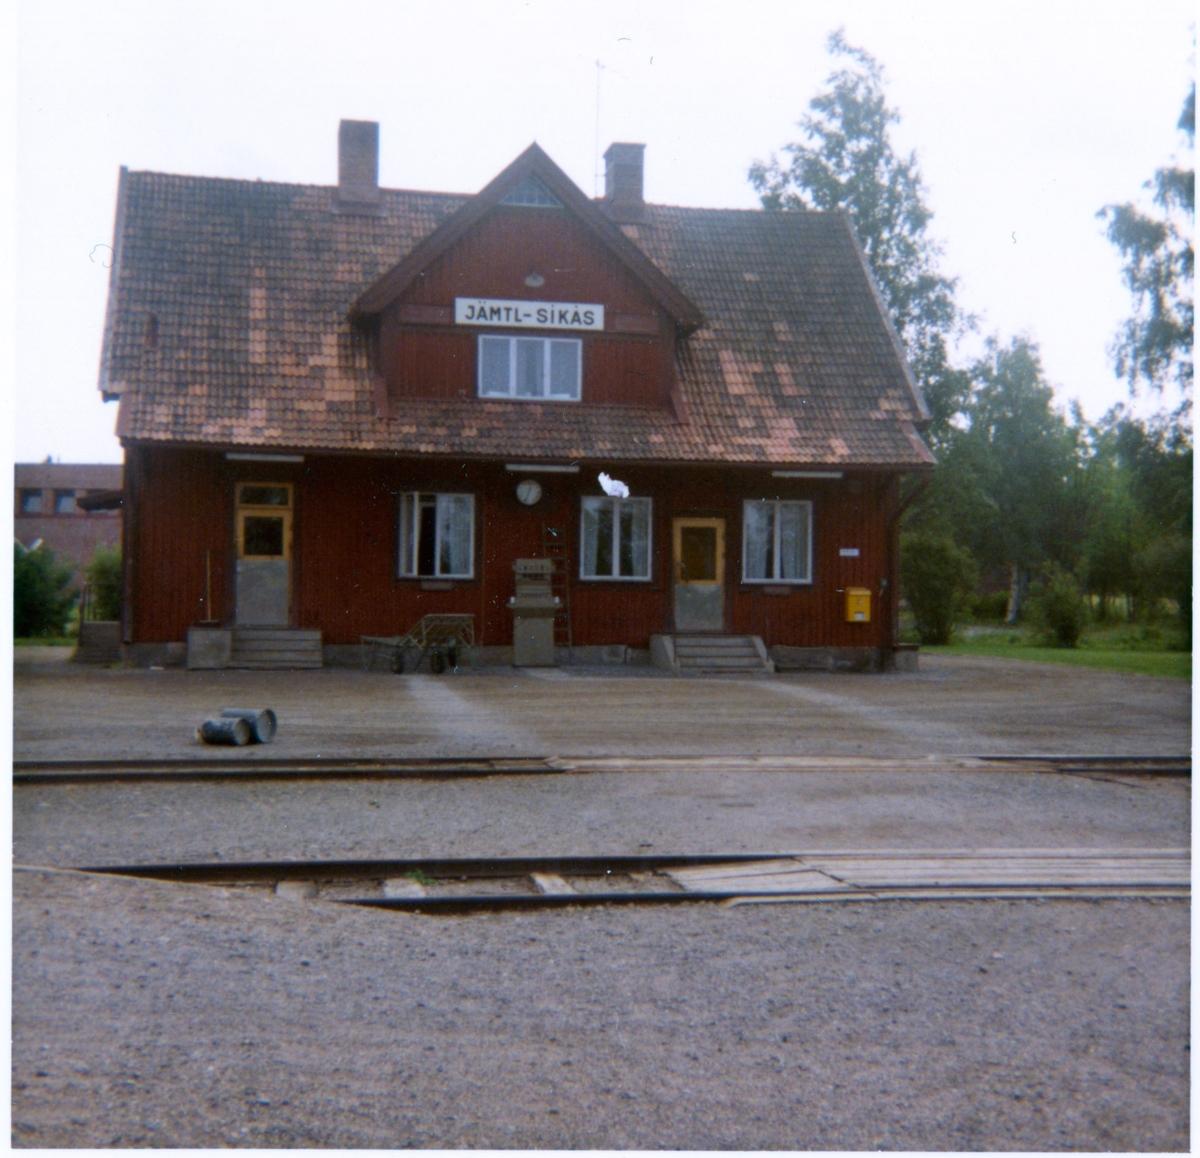 Jämtlands -Sikås station